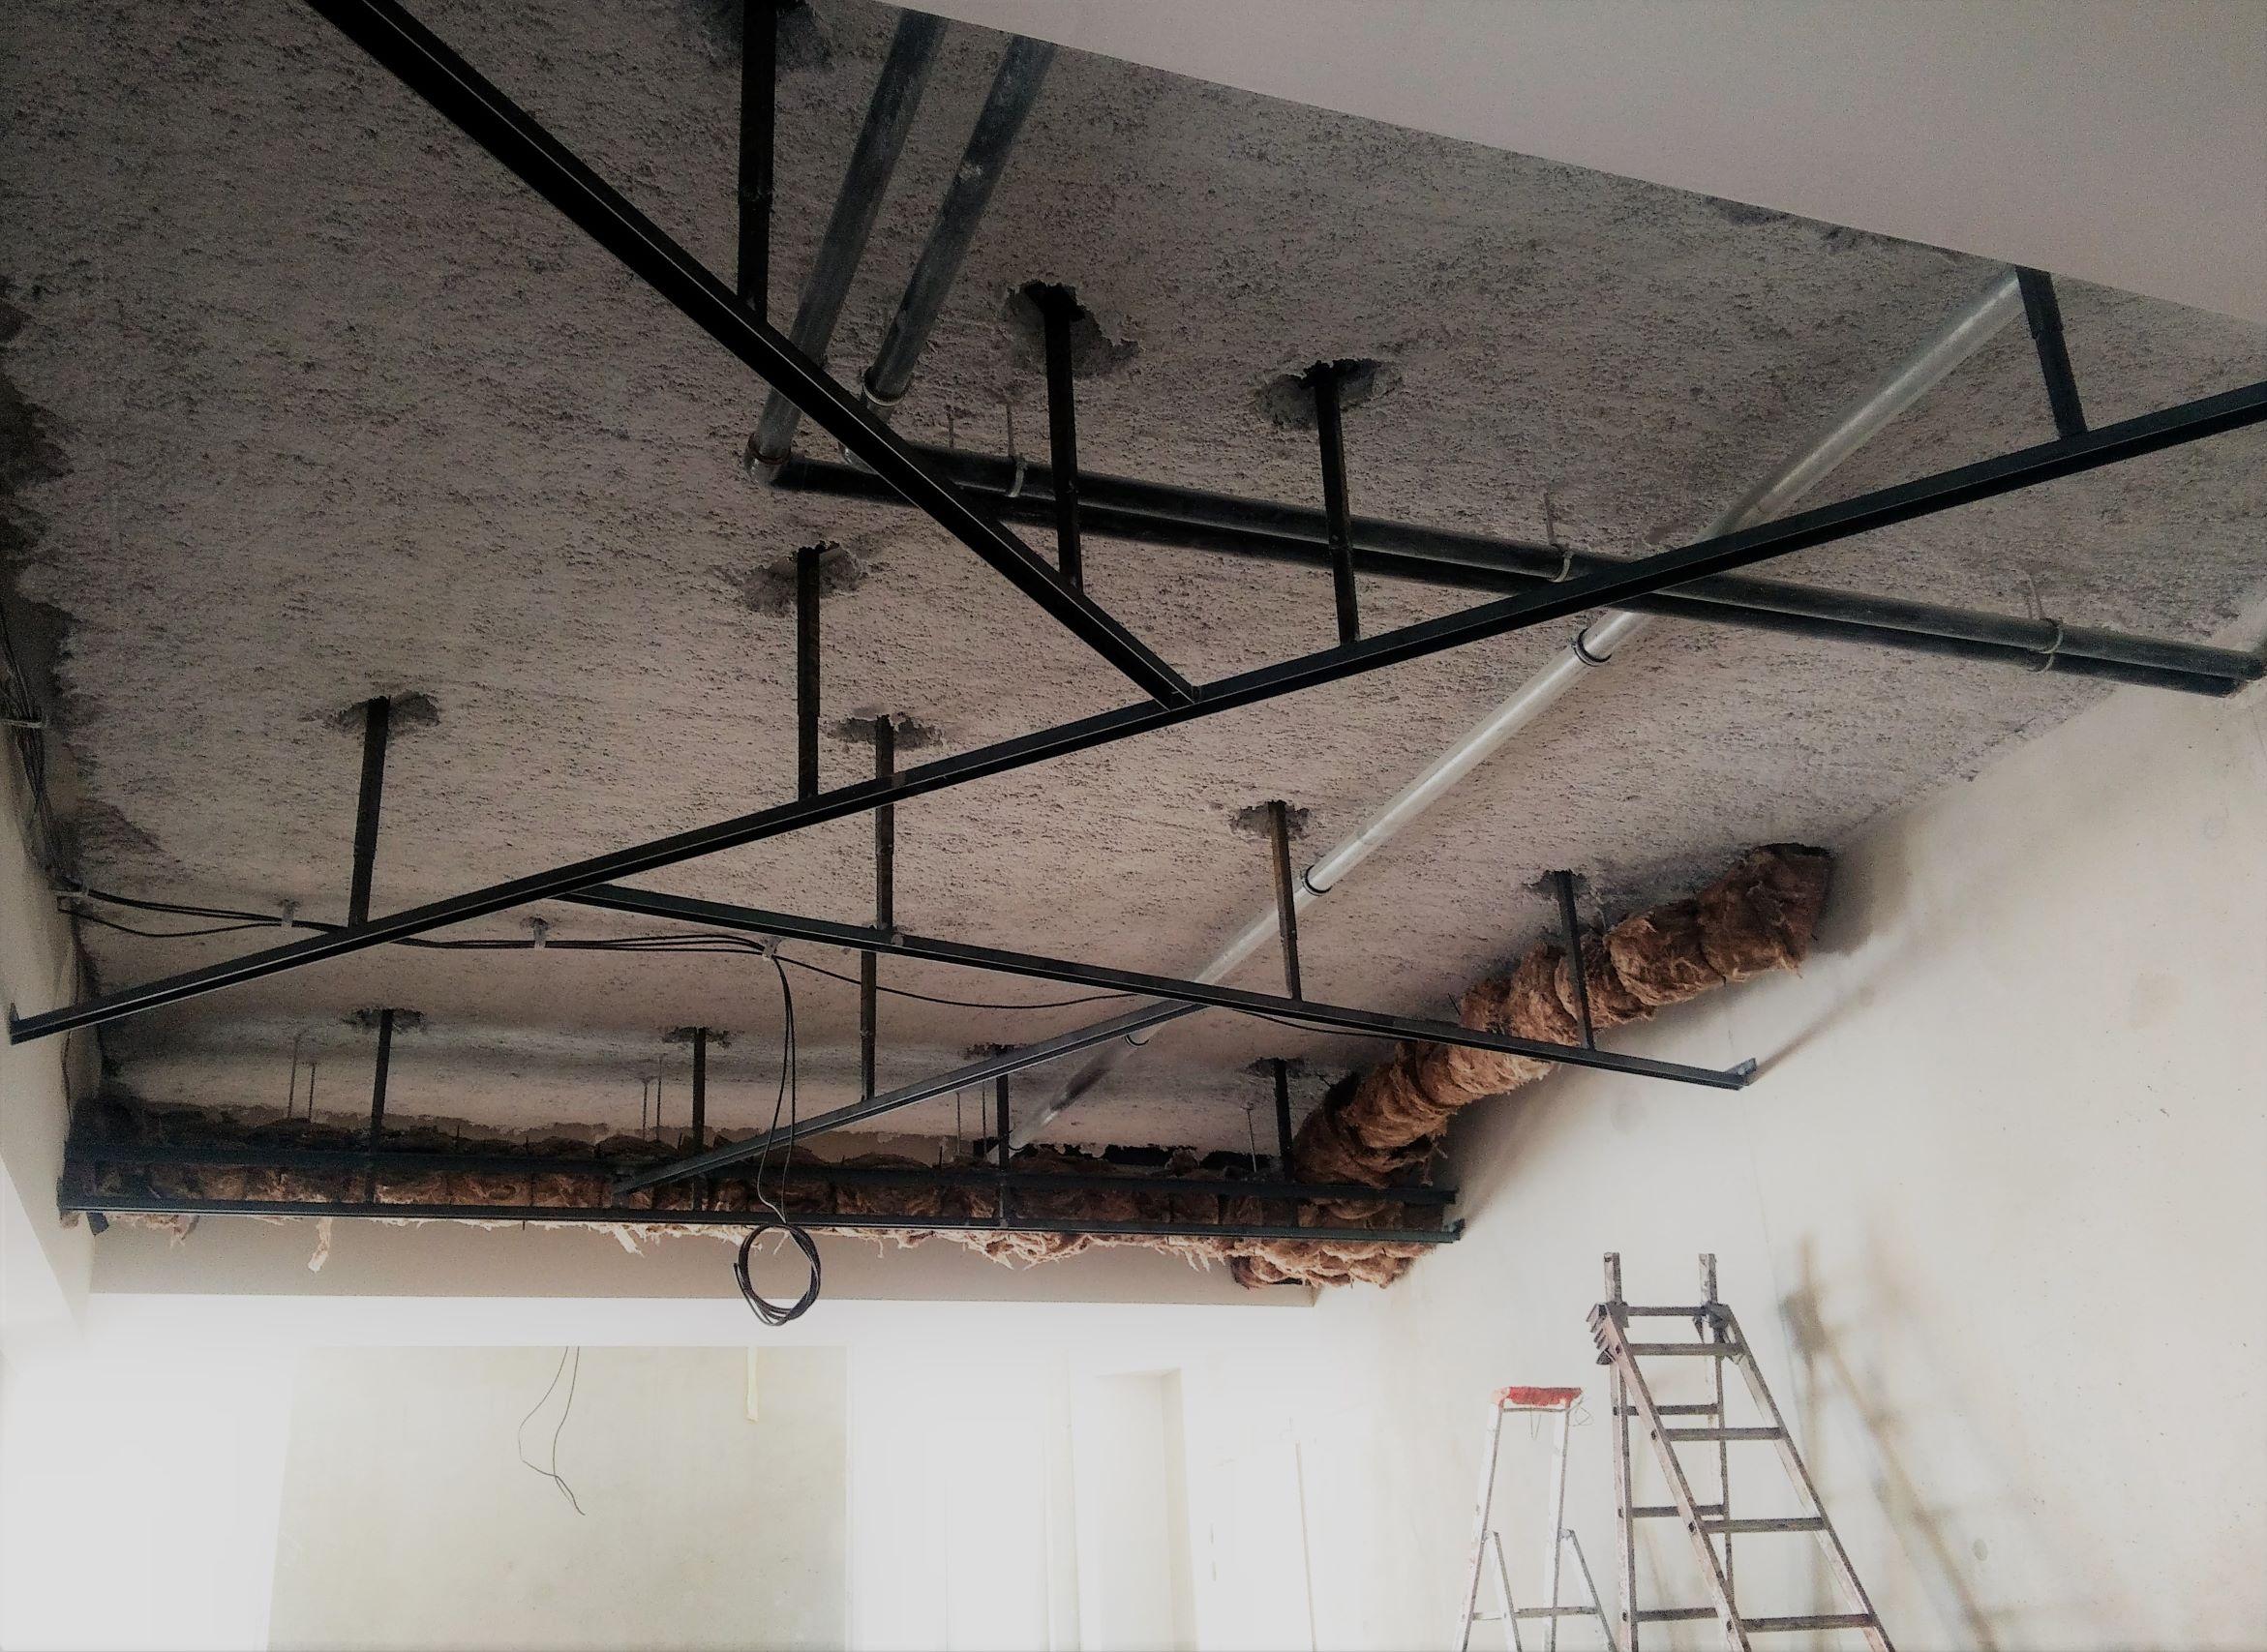 Inoxngo - plafond tendu chantier R